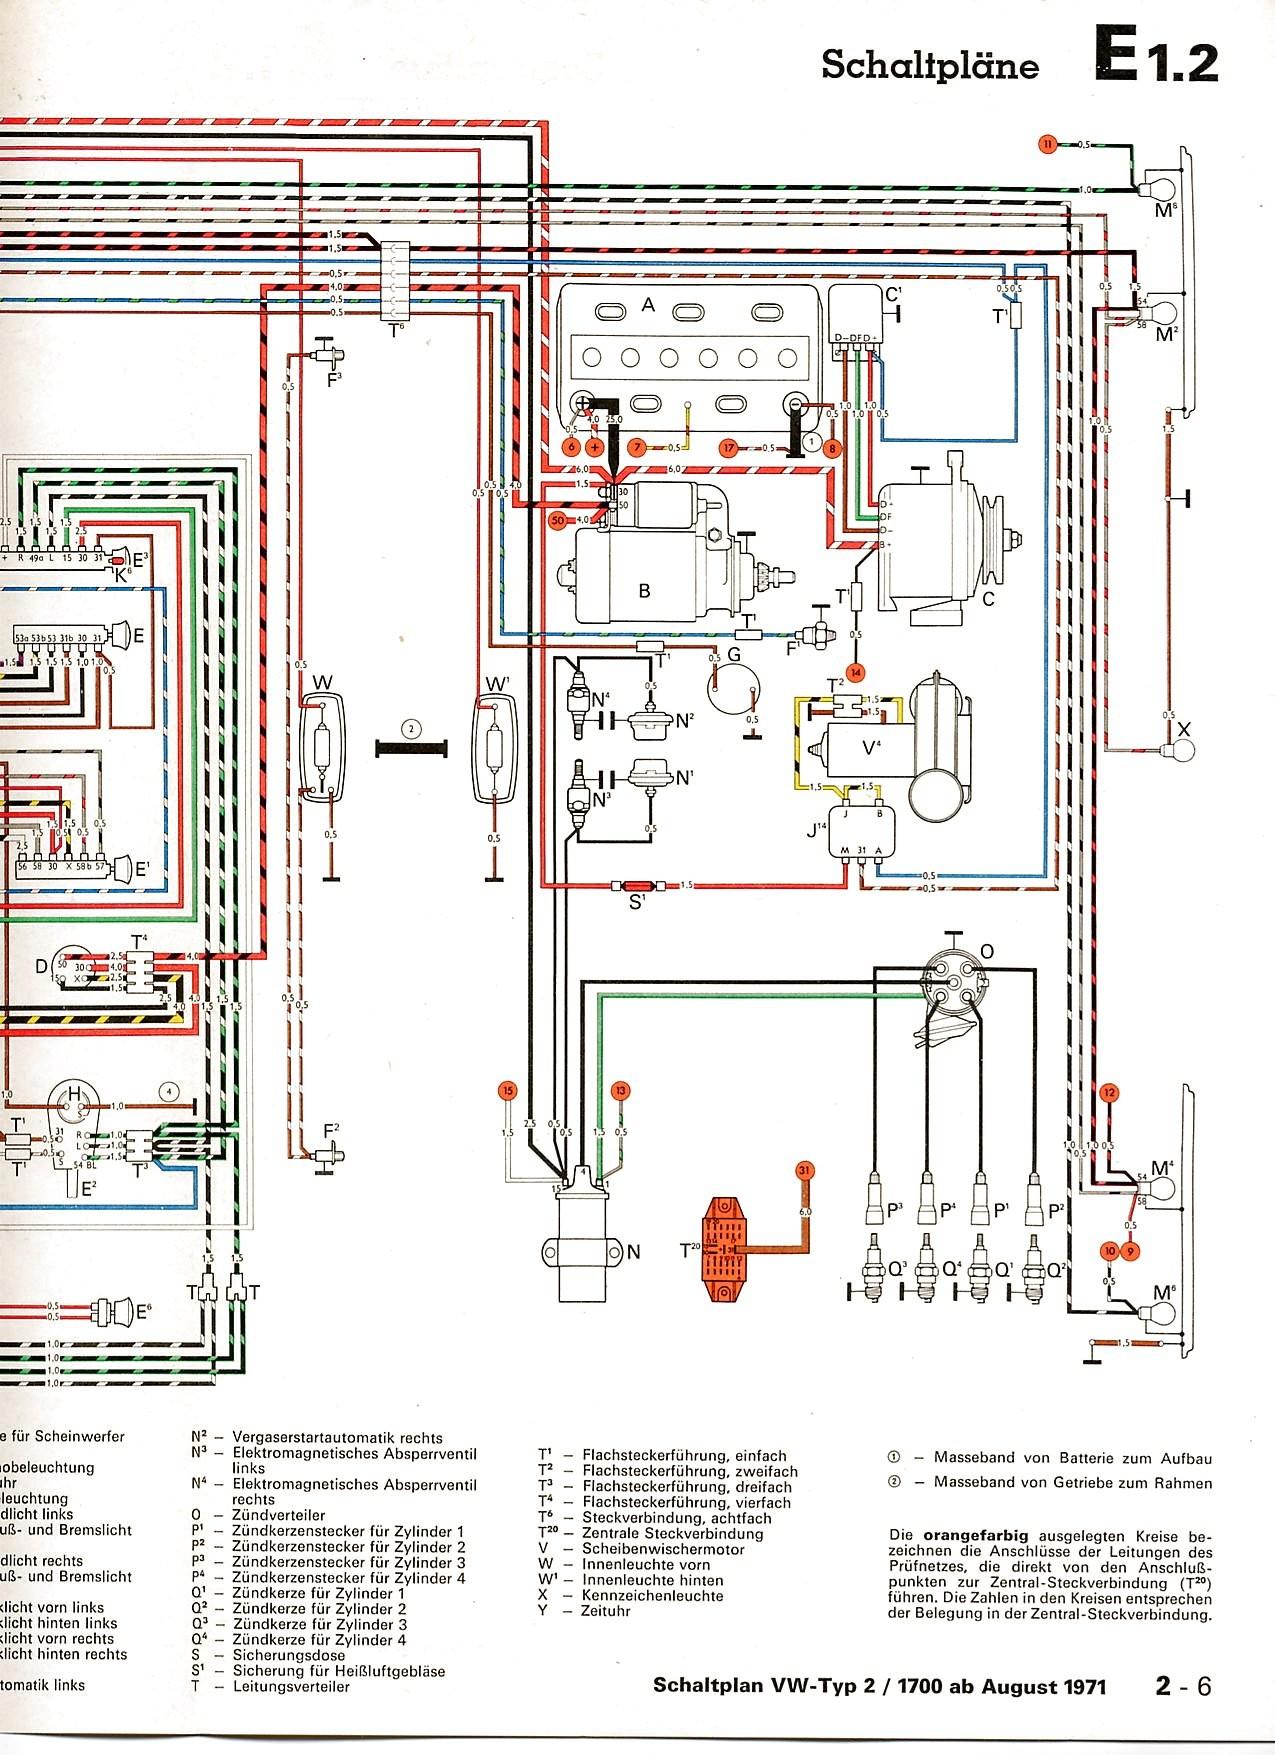 Colored Wiring Diagram Vw Type 3 Portal 1969 Bus Harness 1 Engine In Color 1964 Bug Beetle Rh Detoxicrecenze Com 1973